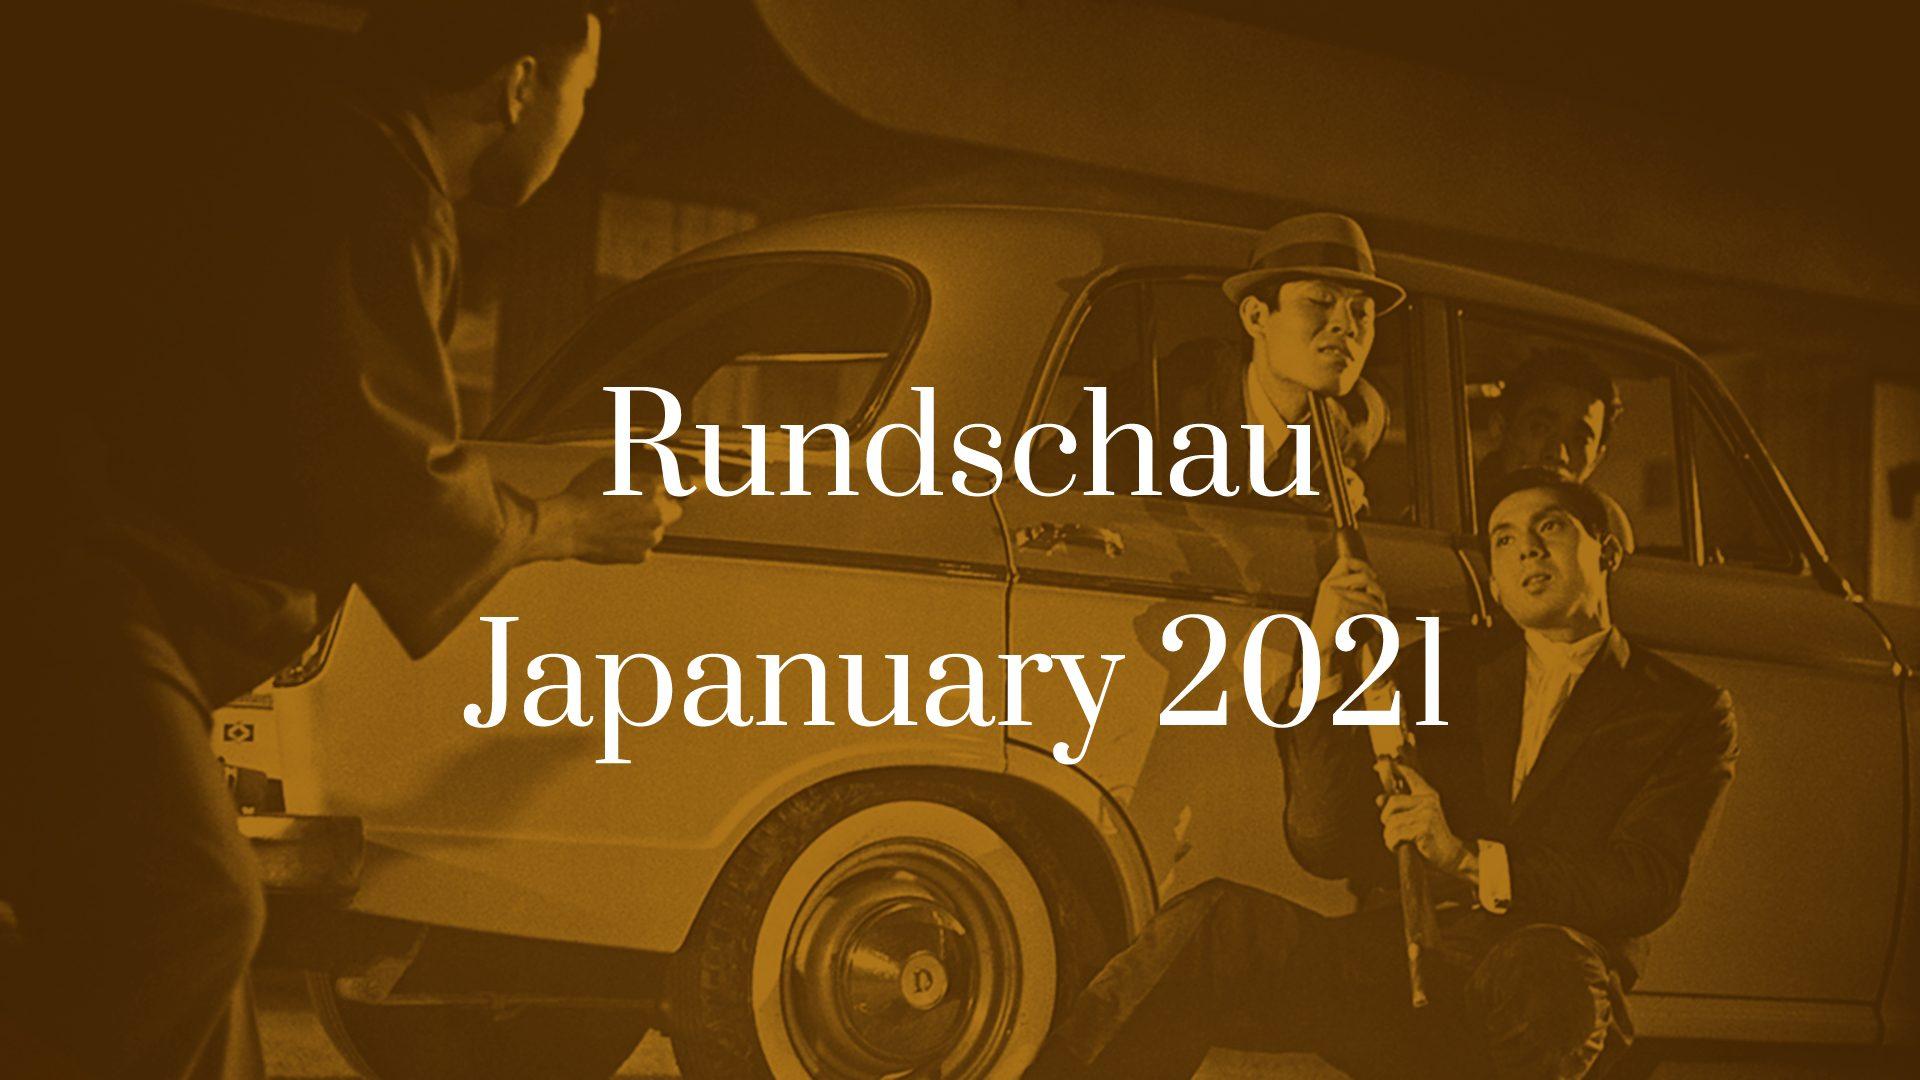 Titelbild zu Rundschau Japanuary 2021